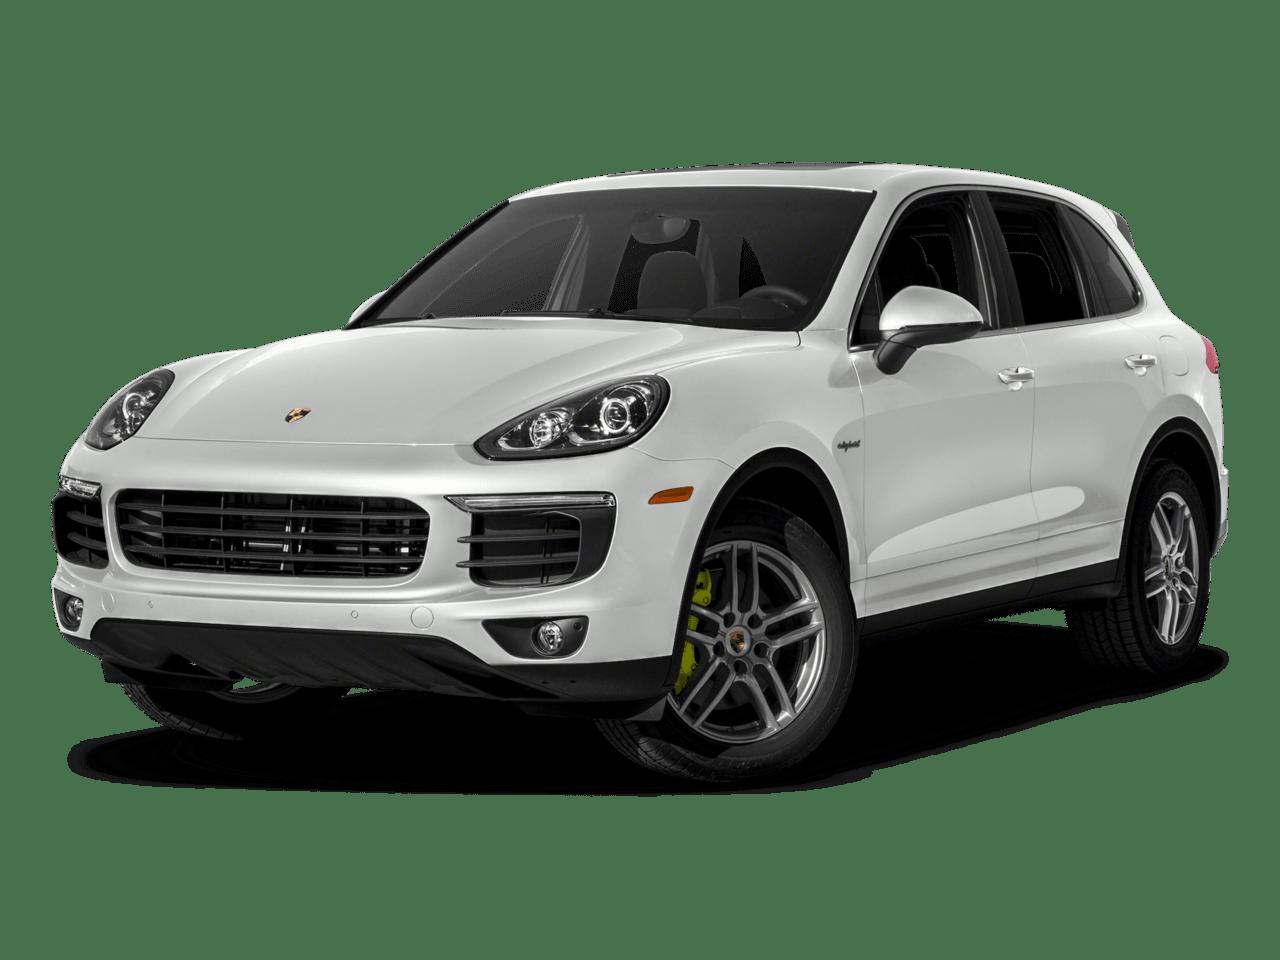 Carrara White Metallic - 2018 Porsche Cayenne Hybrid